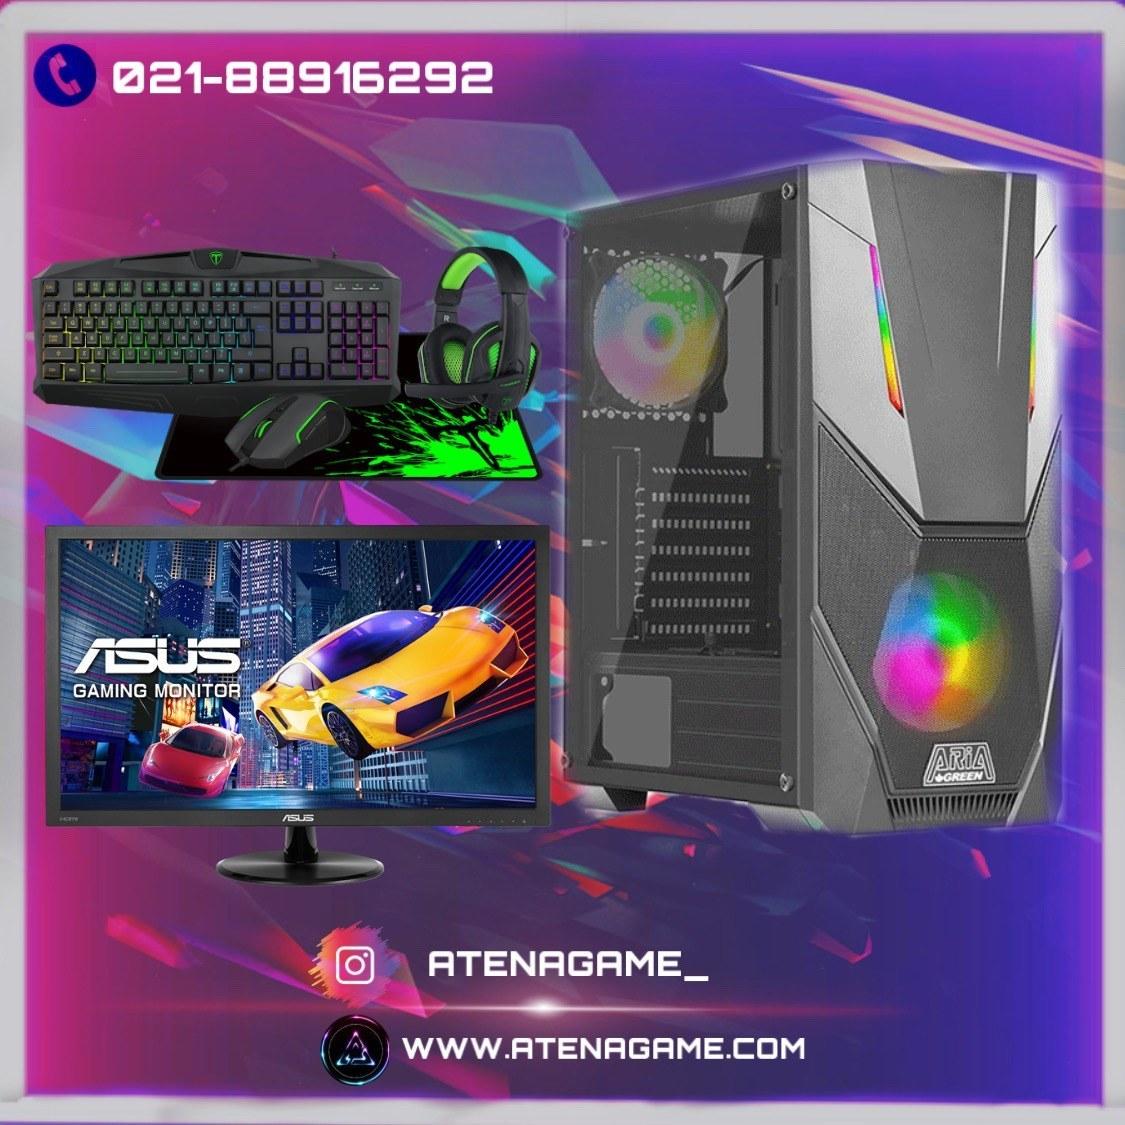 تصویر کامپیوتر دسکتاپ گیمینگ Intel Core i7-9700